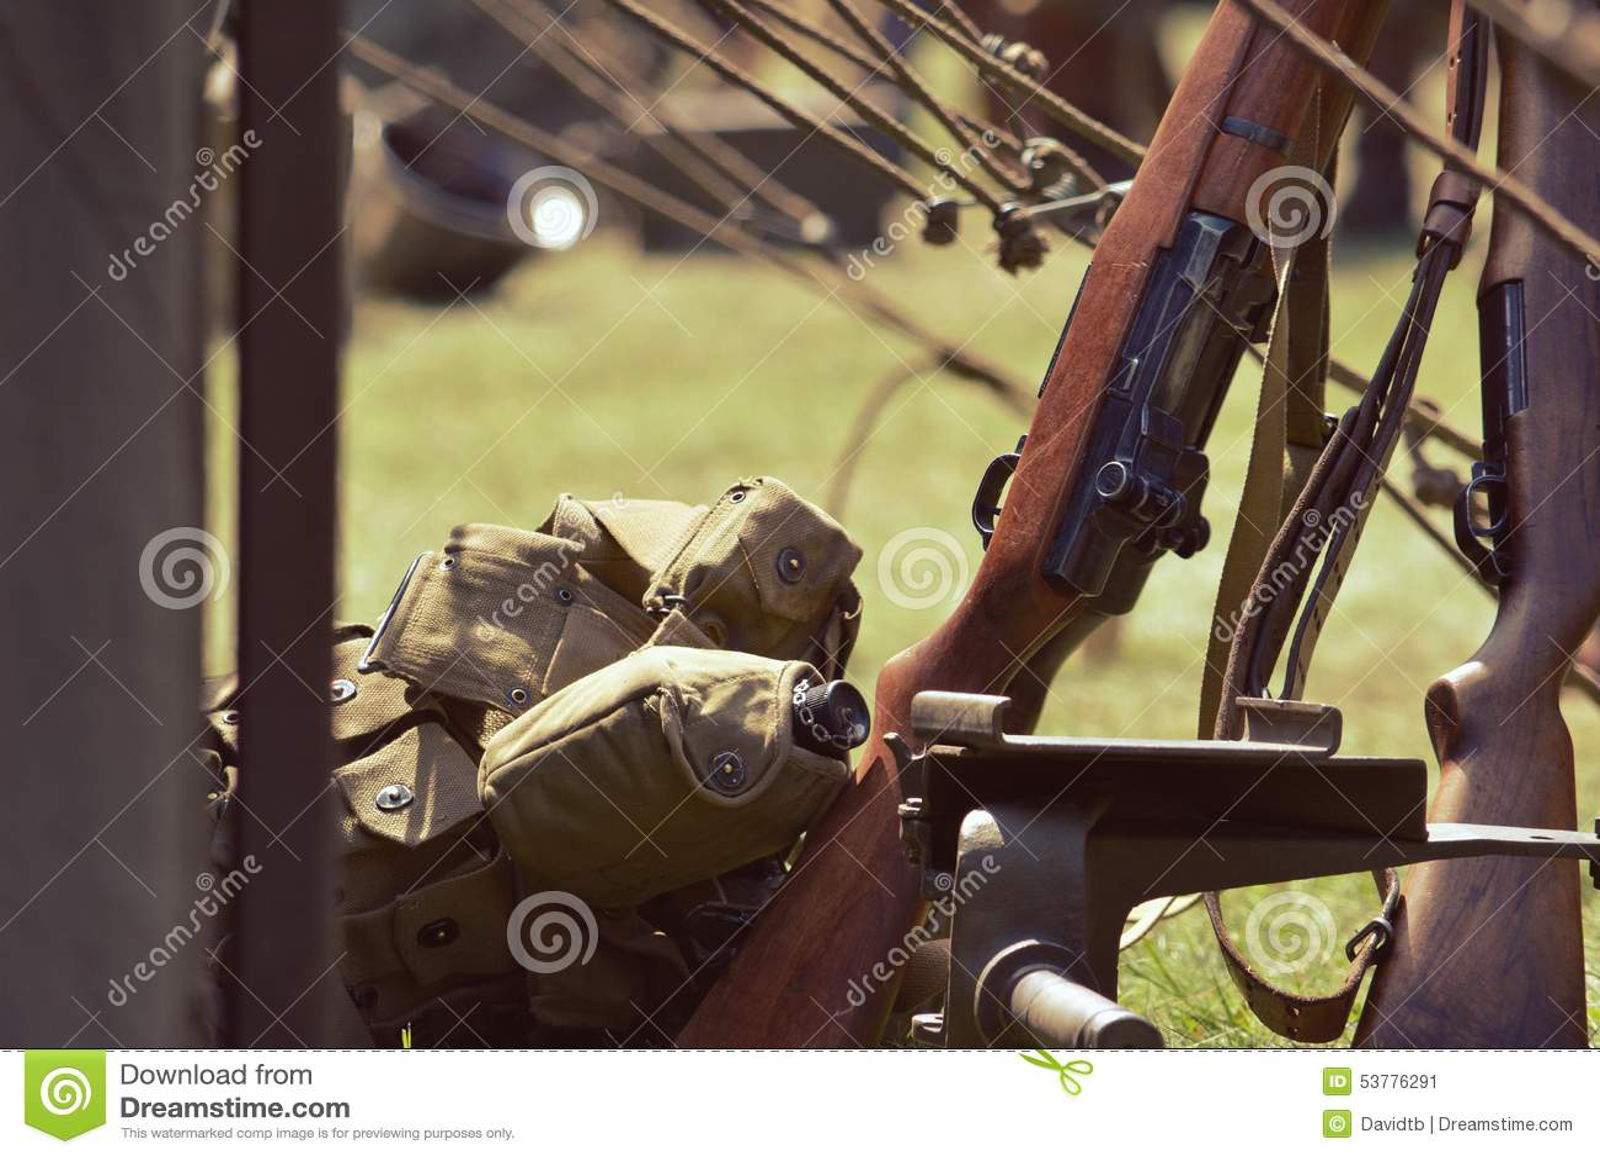 Wojskowych plecaki i pistolety